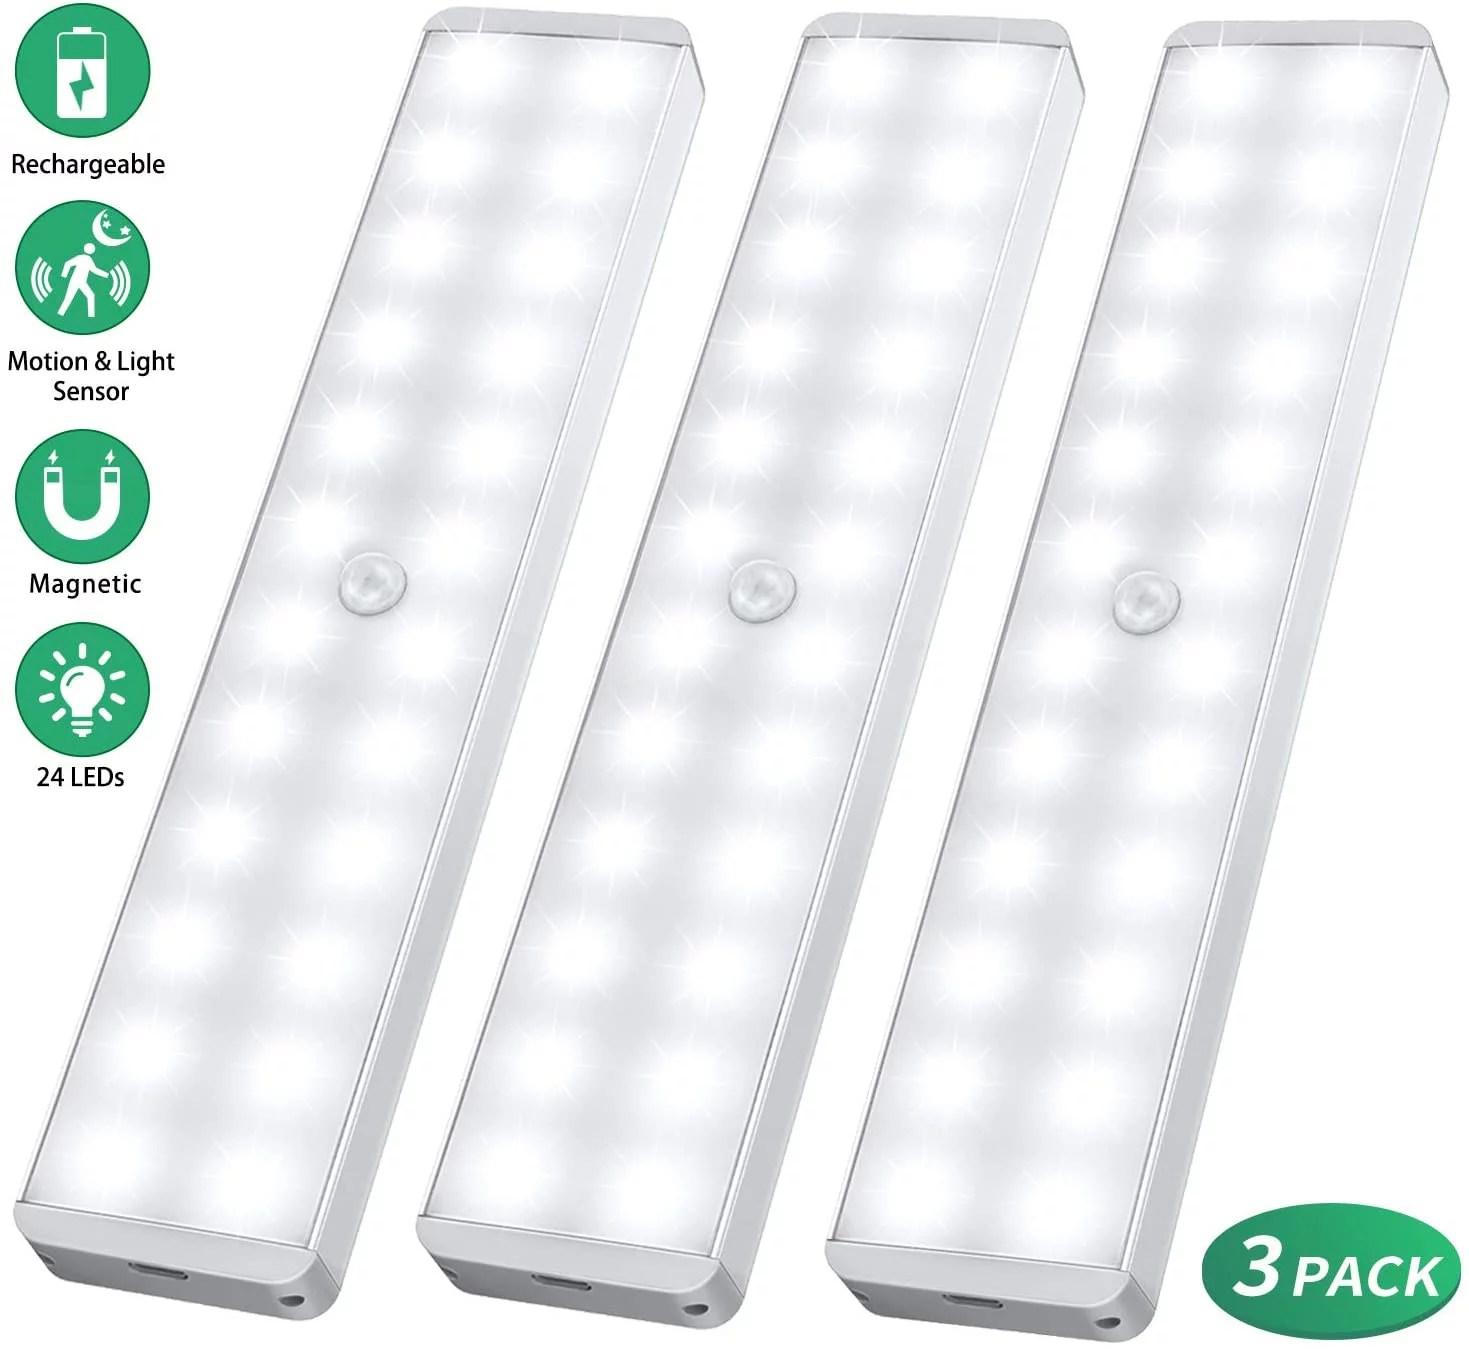 led closet light 24 led newest version dimmer motion sensor closet light under cabinet wireless night light bar suitable for stick anywhere